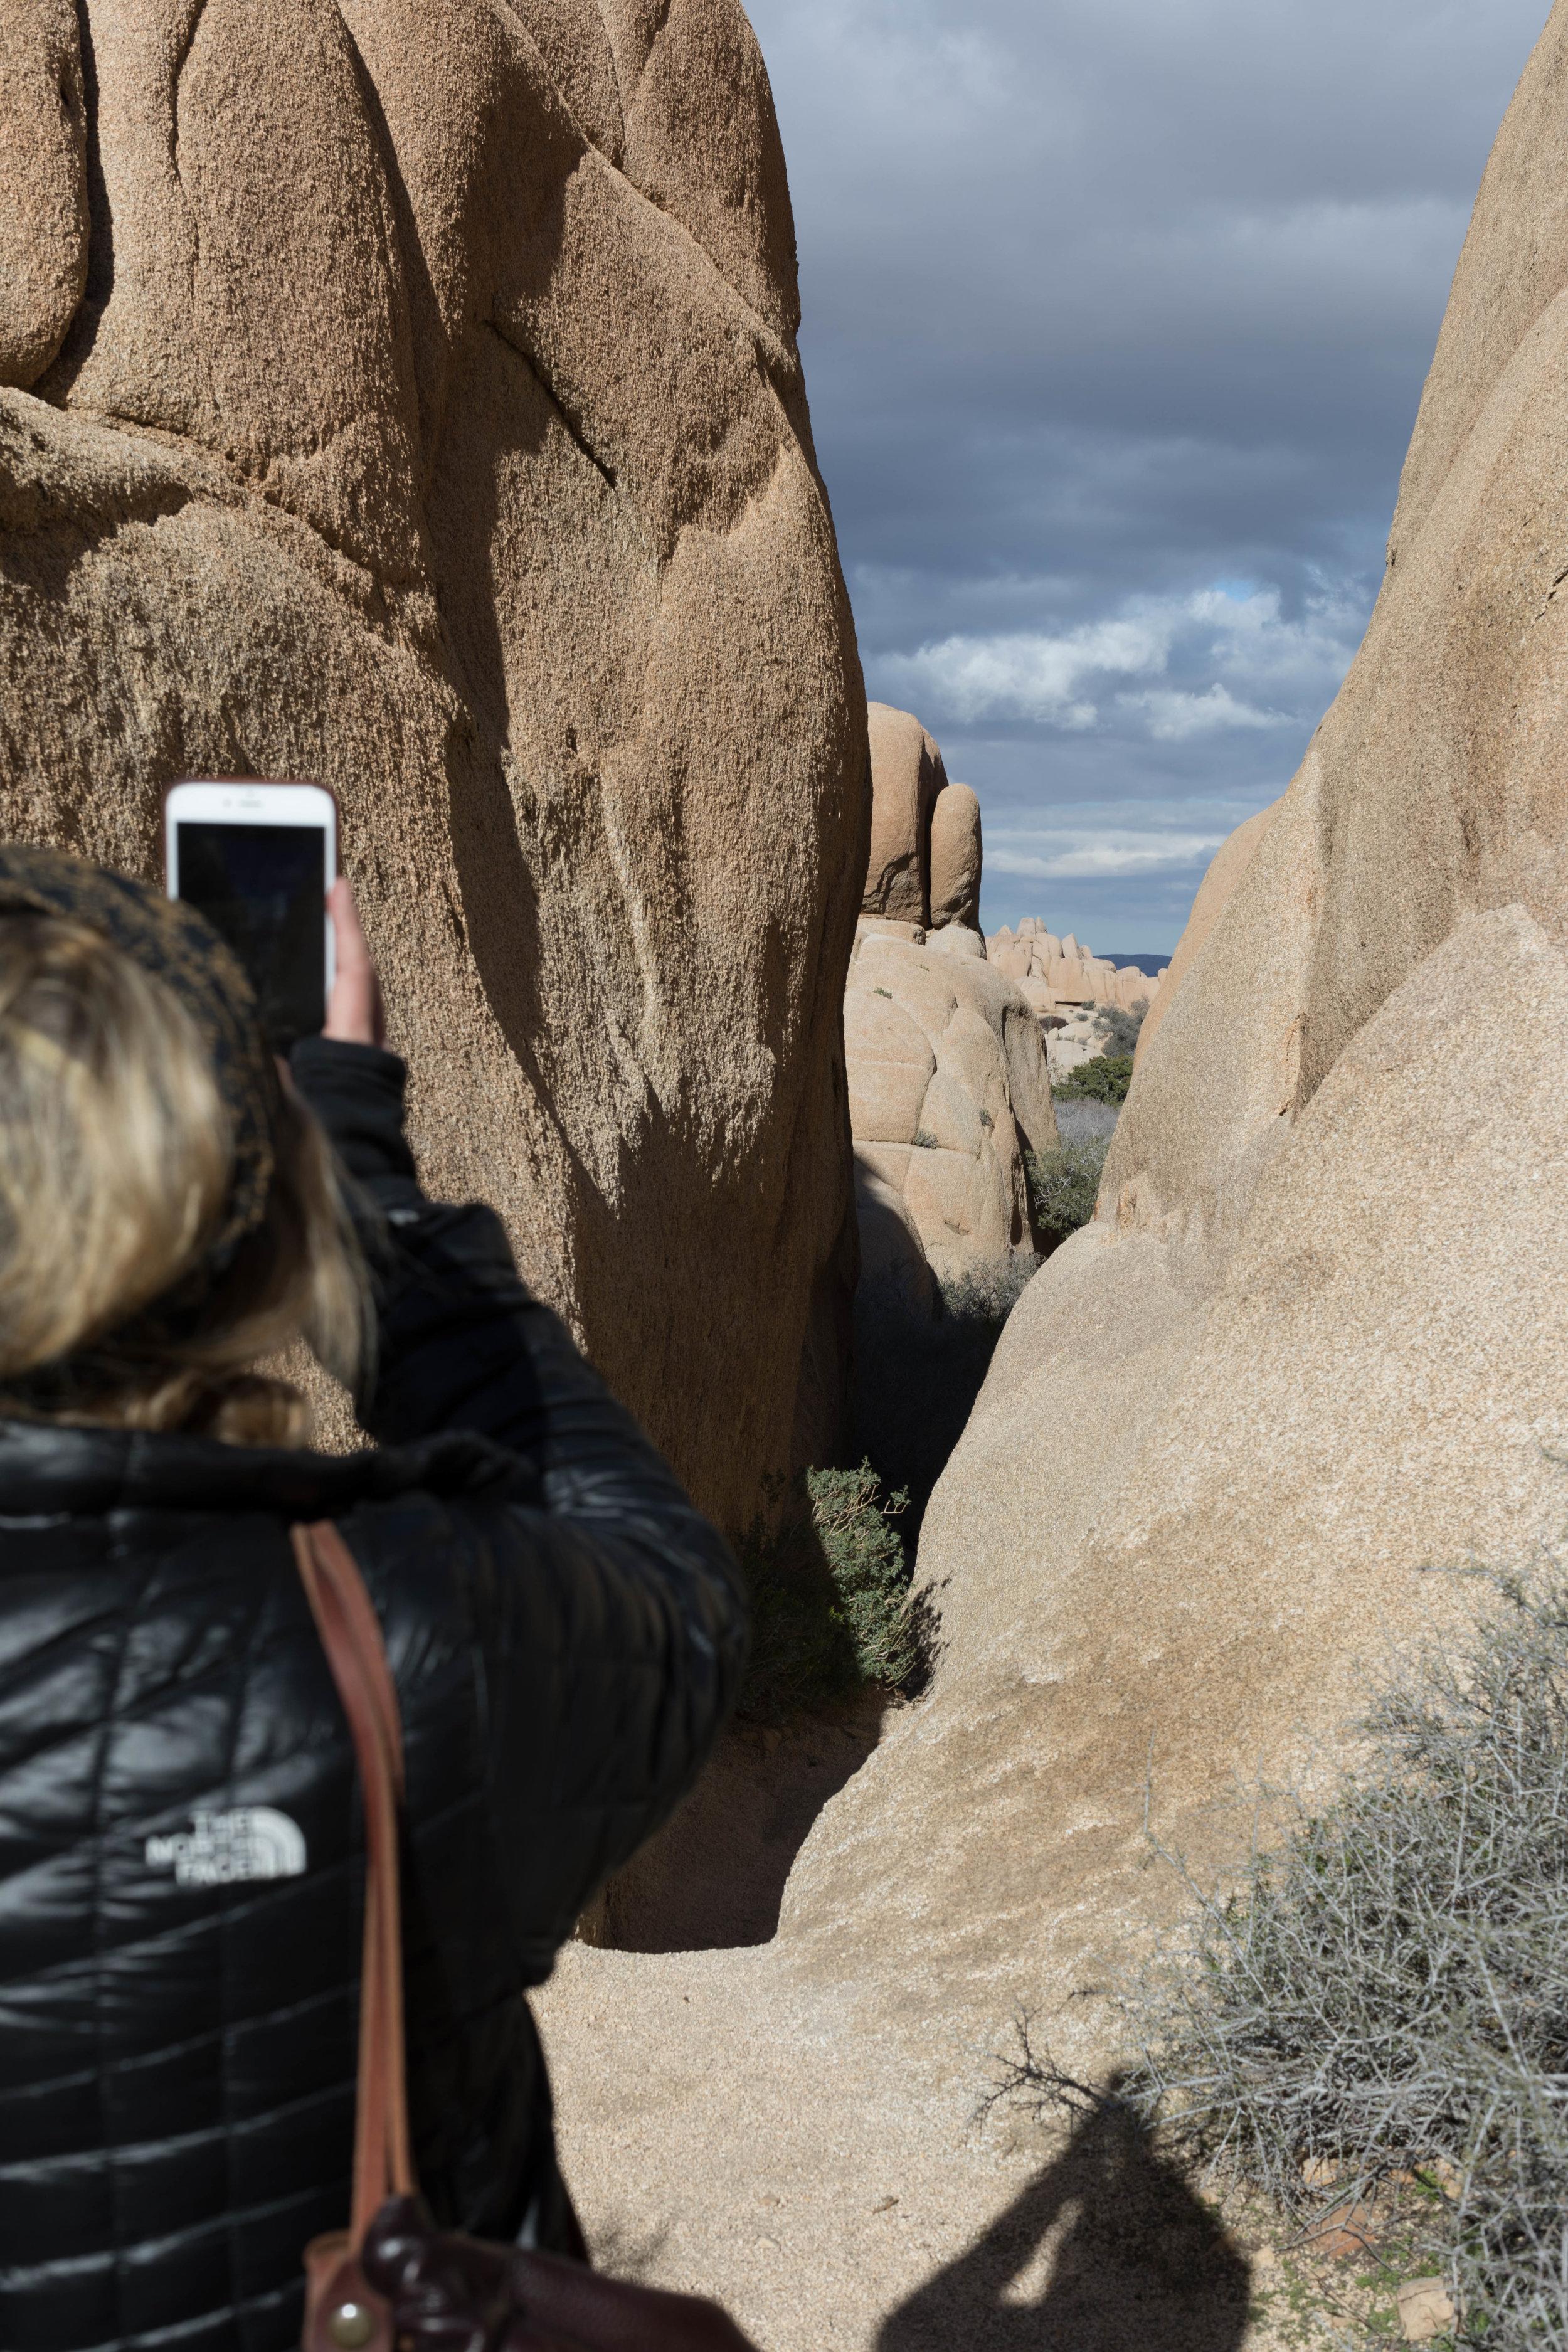 April taking a photo at Jumbo Rocks